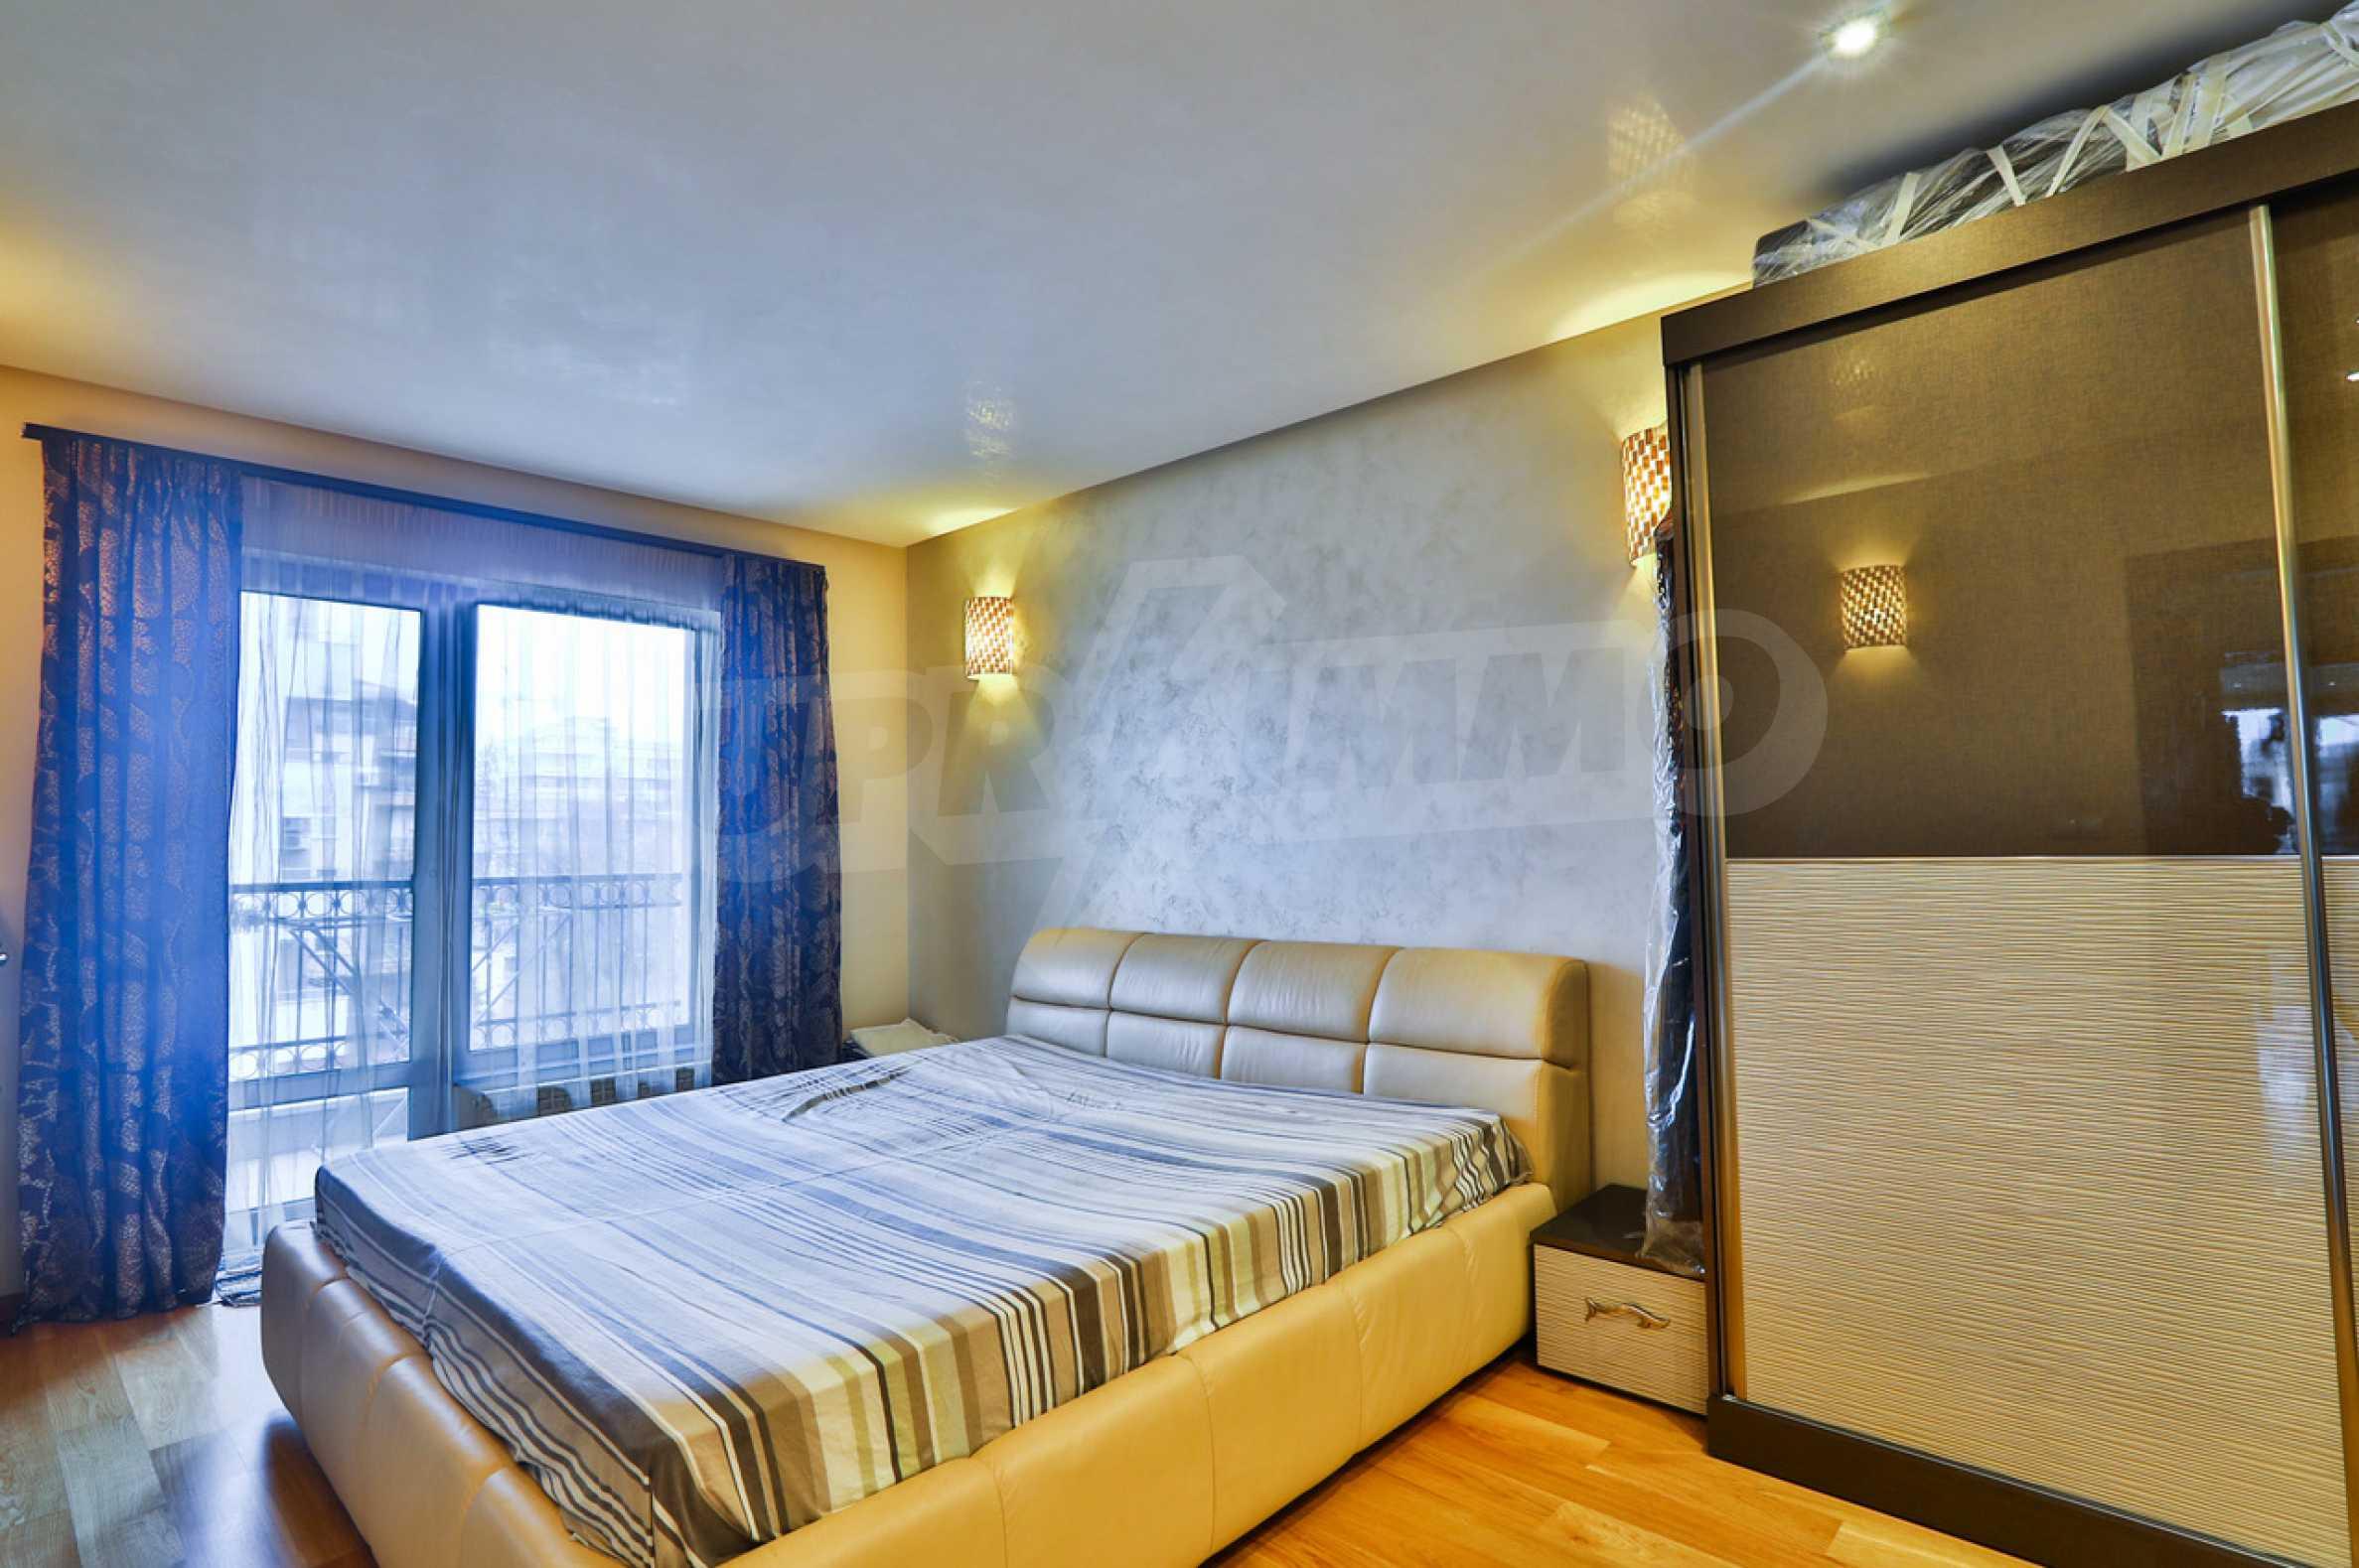 2-bedroom apartment in Sofia 9